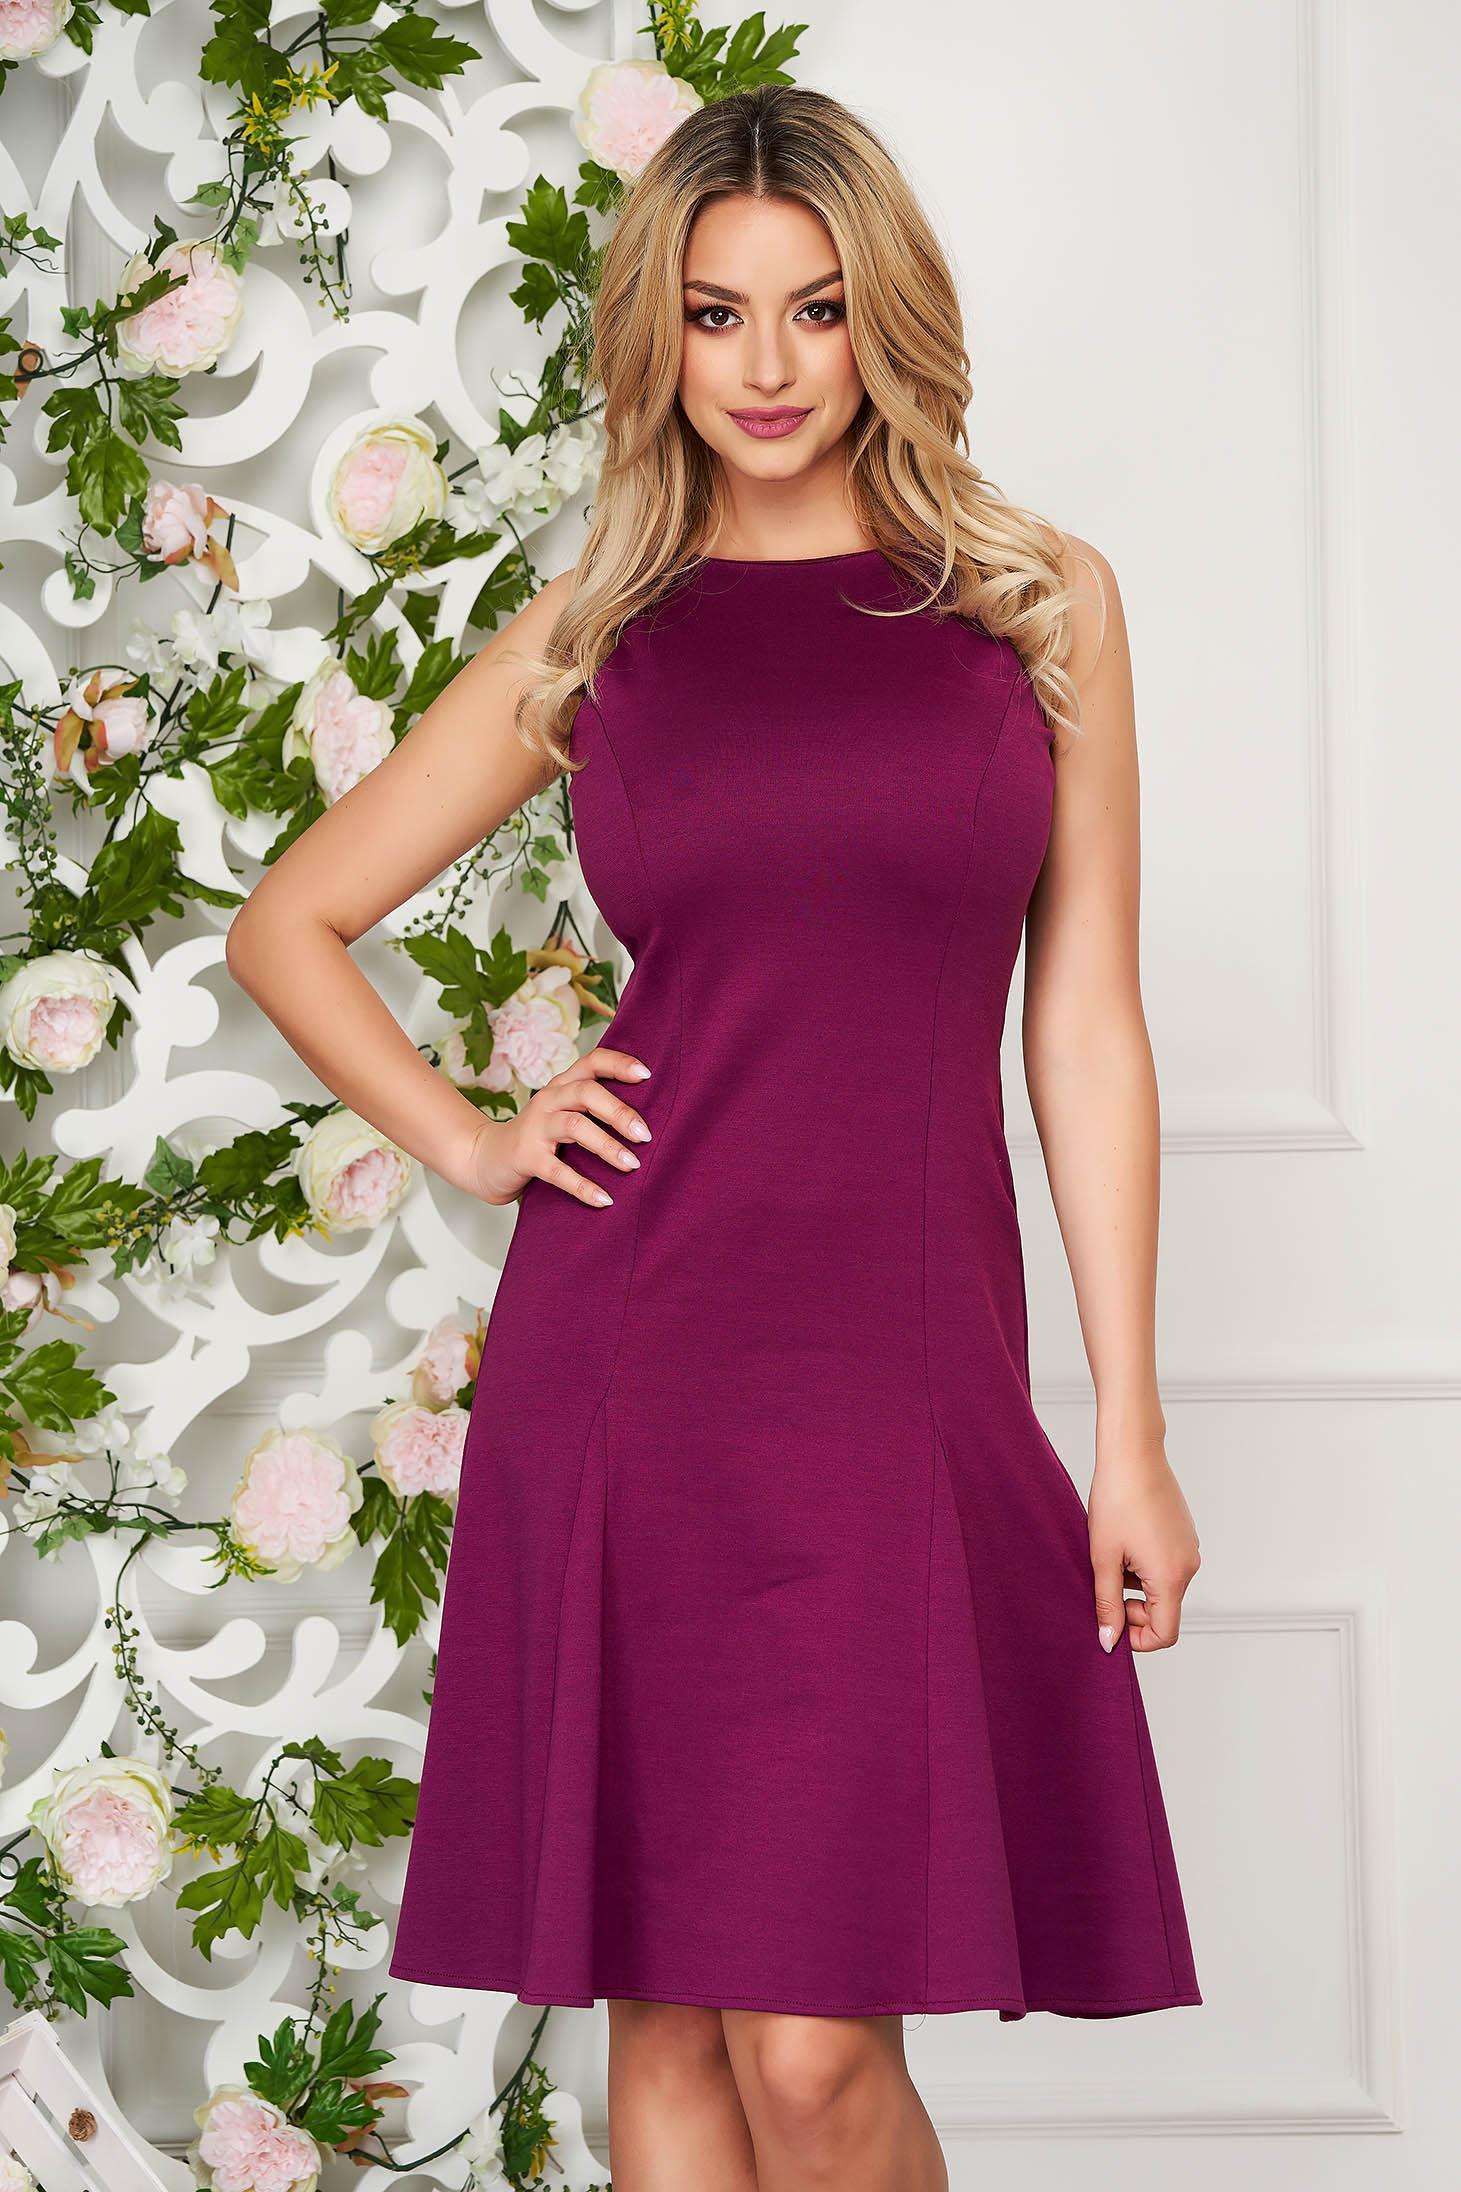 StarShinerS purple daily cloche dress from elastic fabric sleeveless